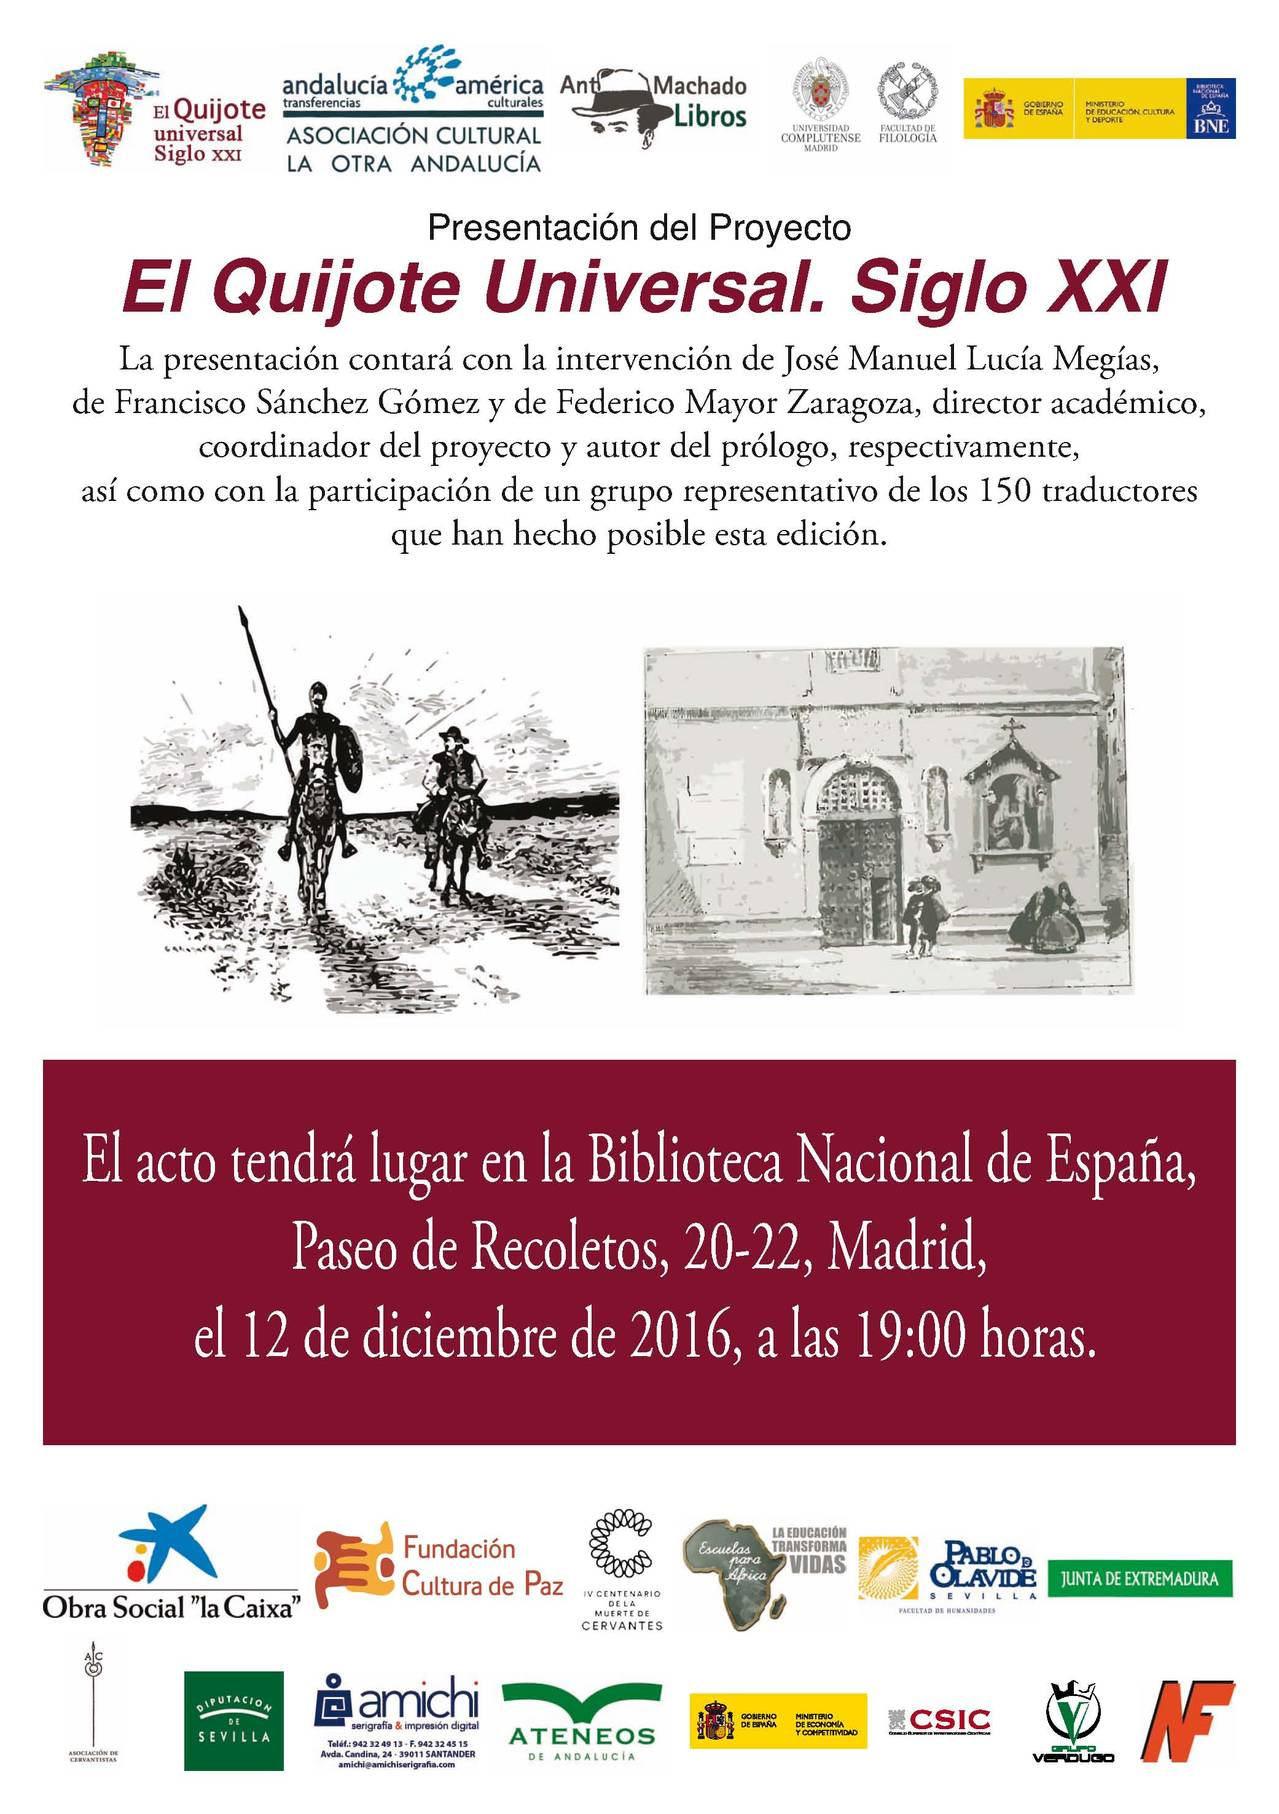 El Quijote universal. Siglo XXI